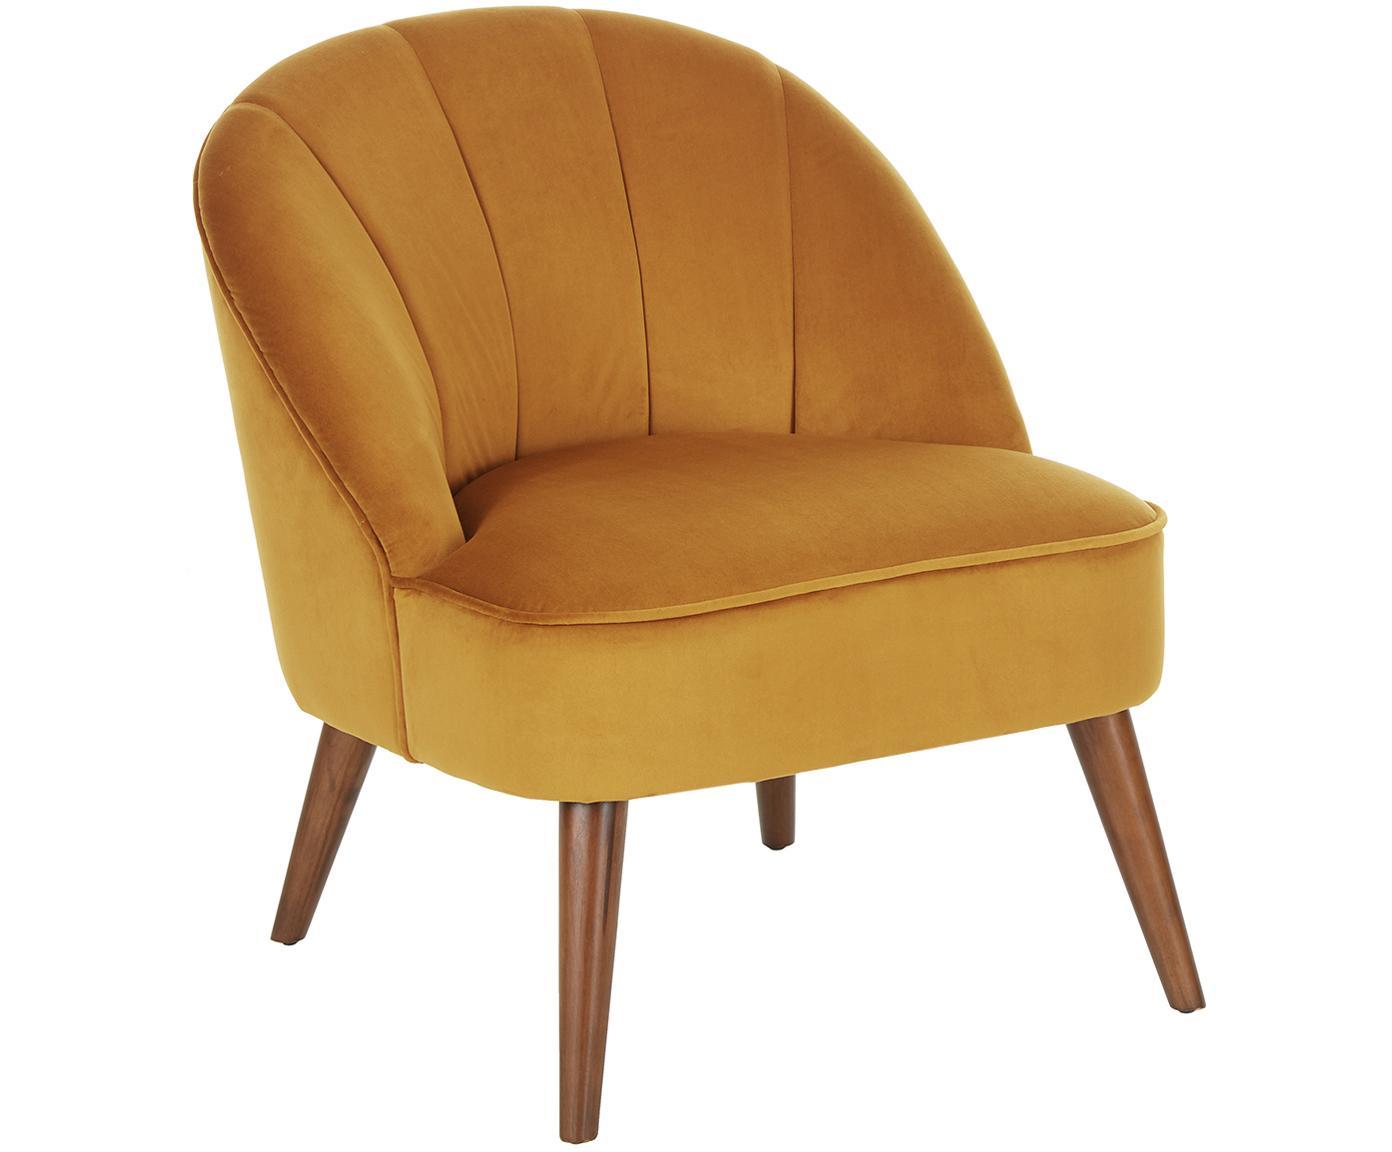 Fluwelen fauteuil Aya, Bekleding: fluweel (polyester), Poten: berkenhout, gelakt, Bekleding: amberkleurig. Poten: berkenhoutkleurig, B 73 x D 64 cm